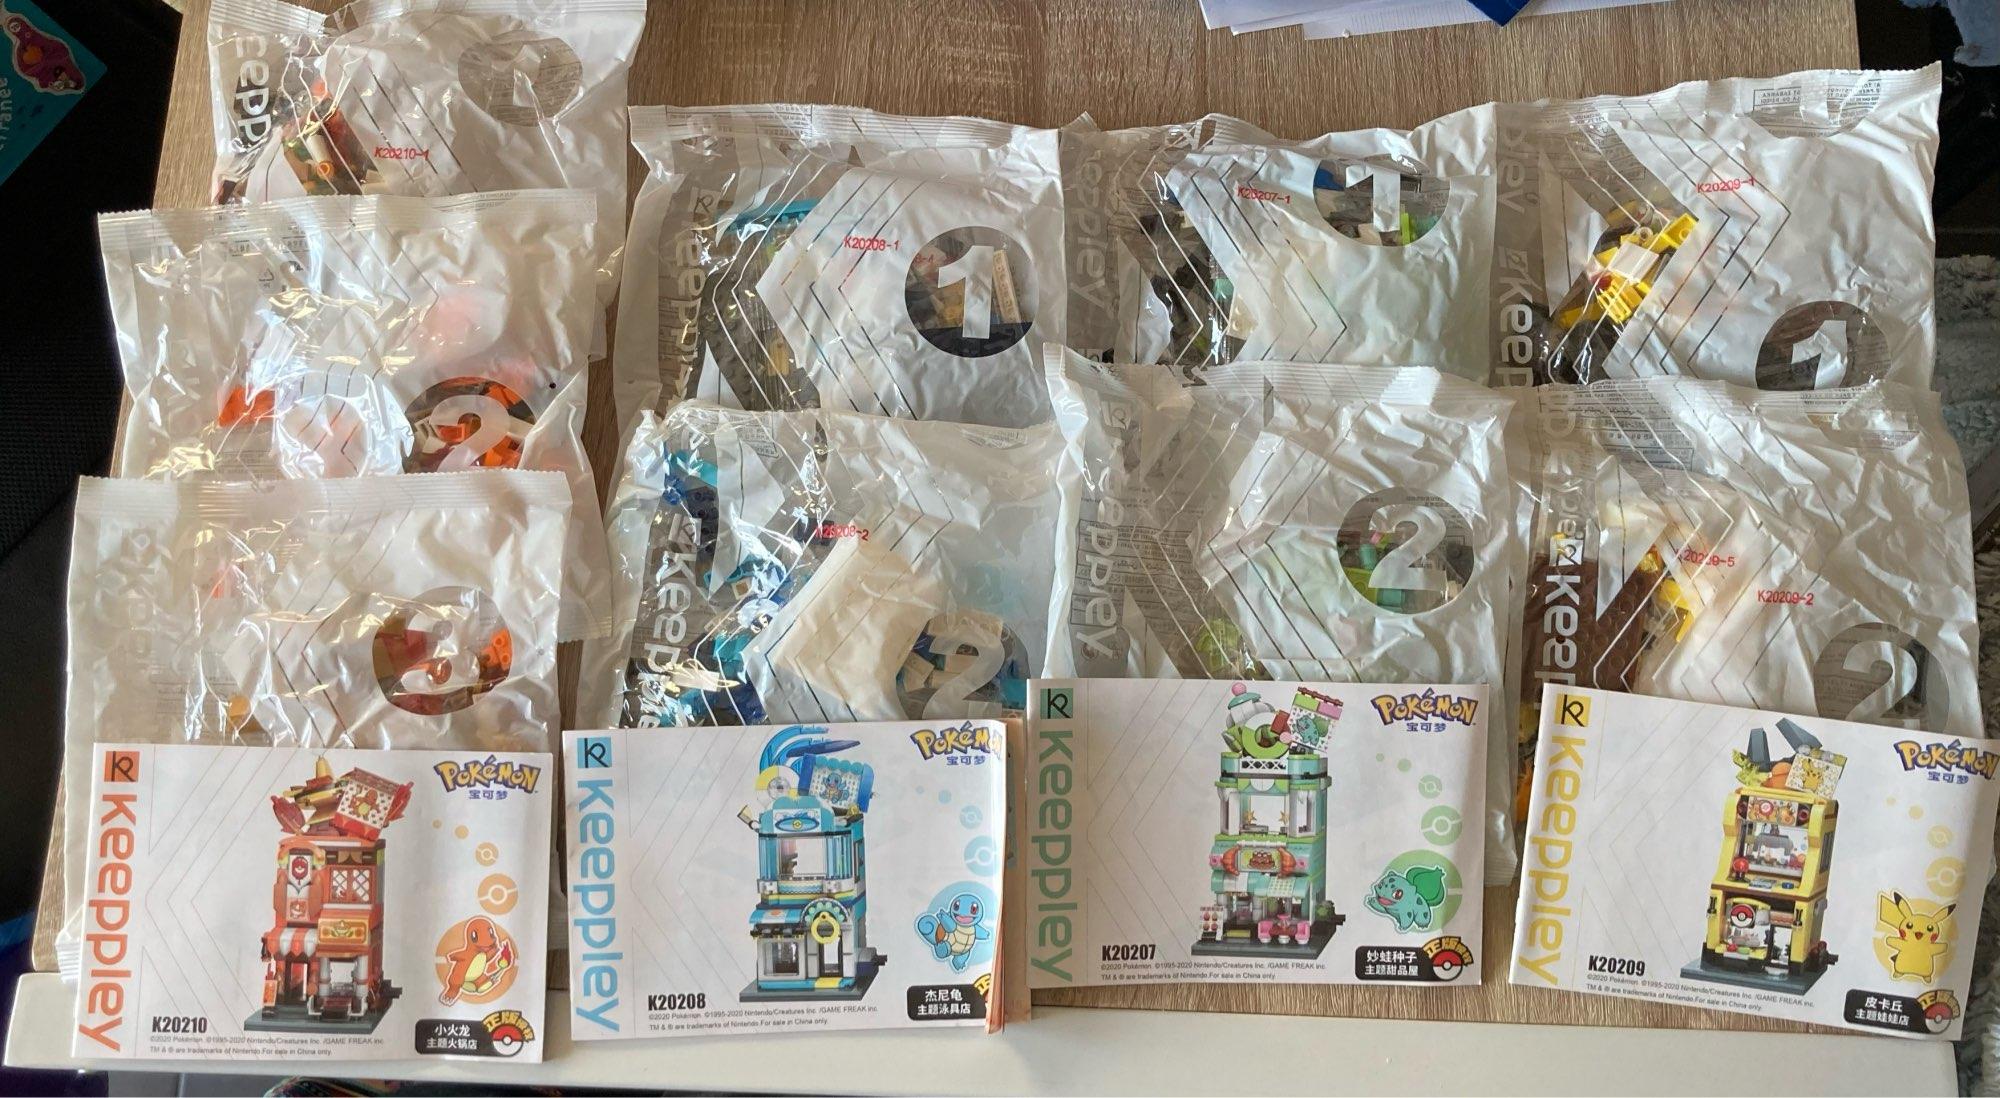 4pcs 2020 New Pokemon Pikachu Street View Pikachu Wonder Frog Seed Building Block Toy Model Set Children Christmas Gift photo review